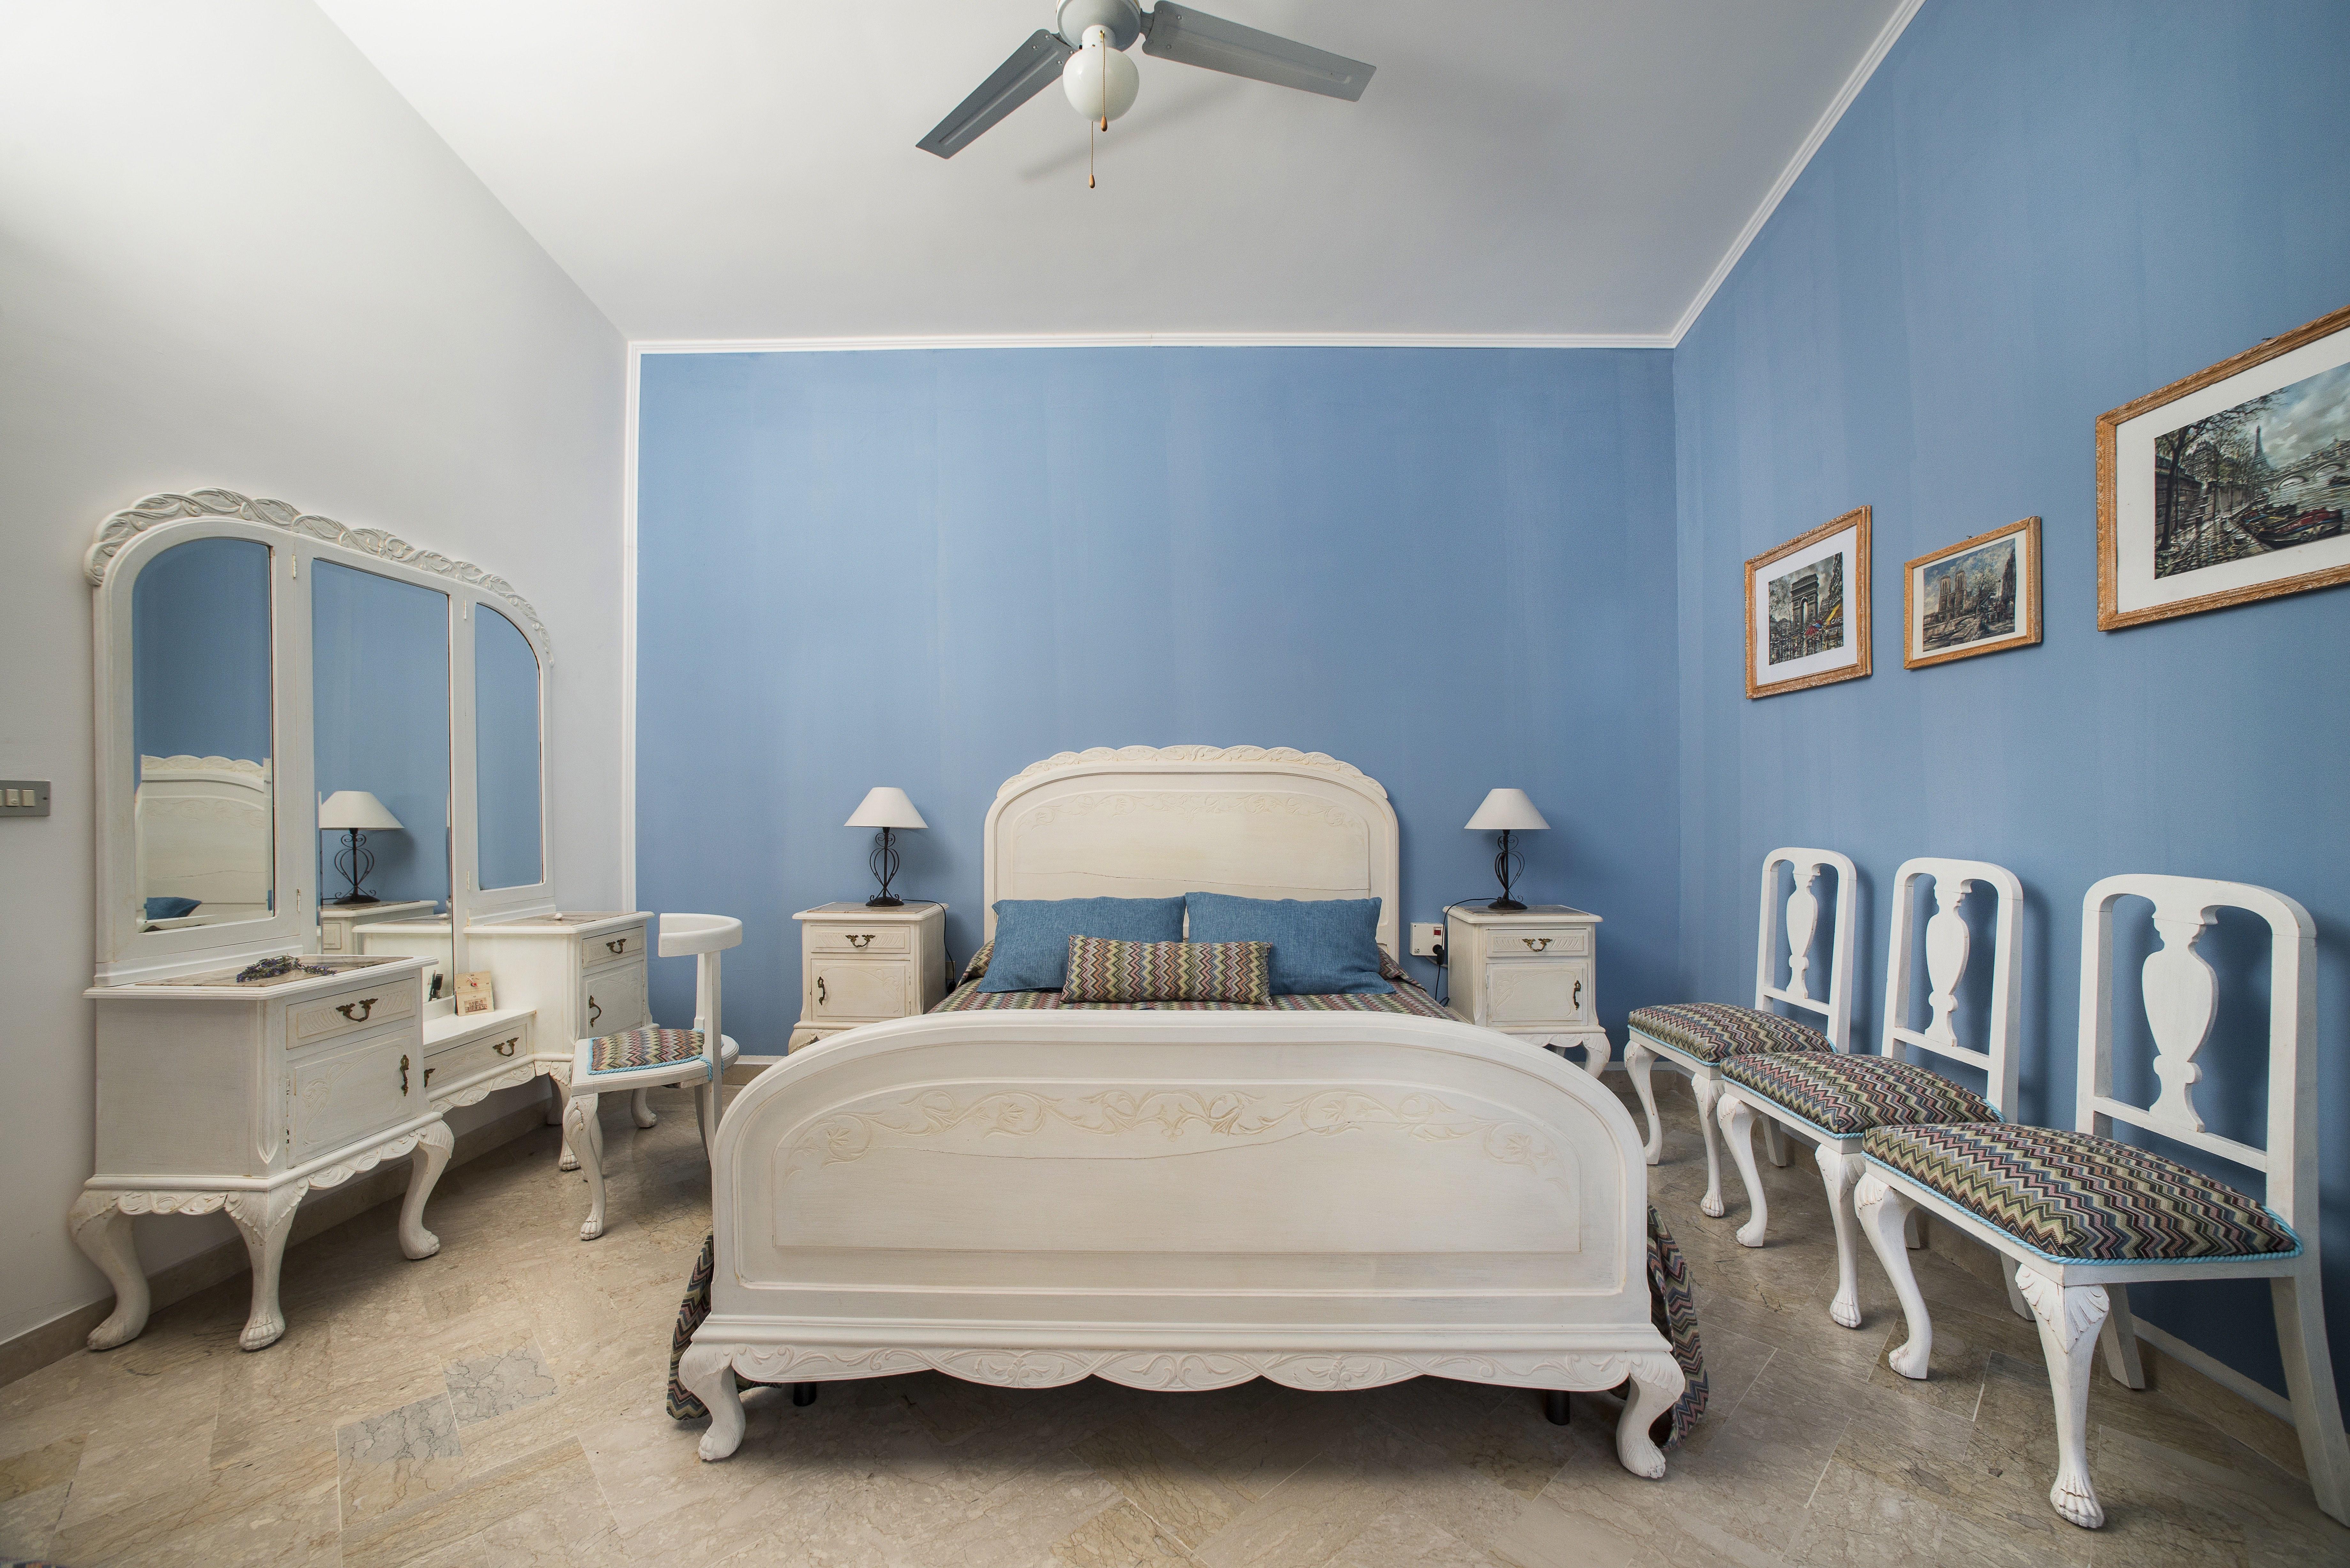 Holiday house Villa Scampati 7 Plätze am Meer mit Garten, Grill und Parkplatz (2388901), Alcamo, Trapani, Sicily, Italy, picture 11